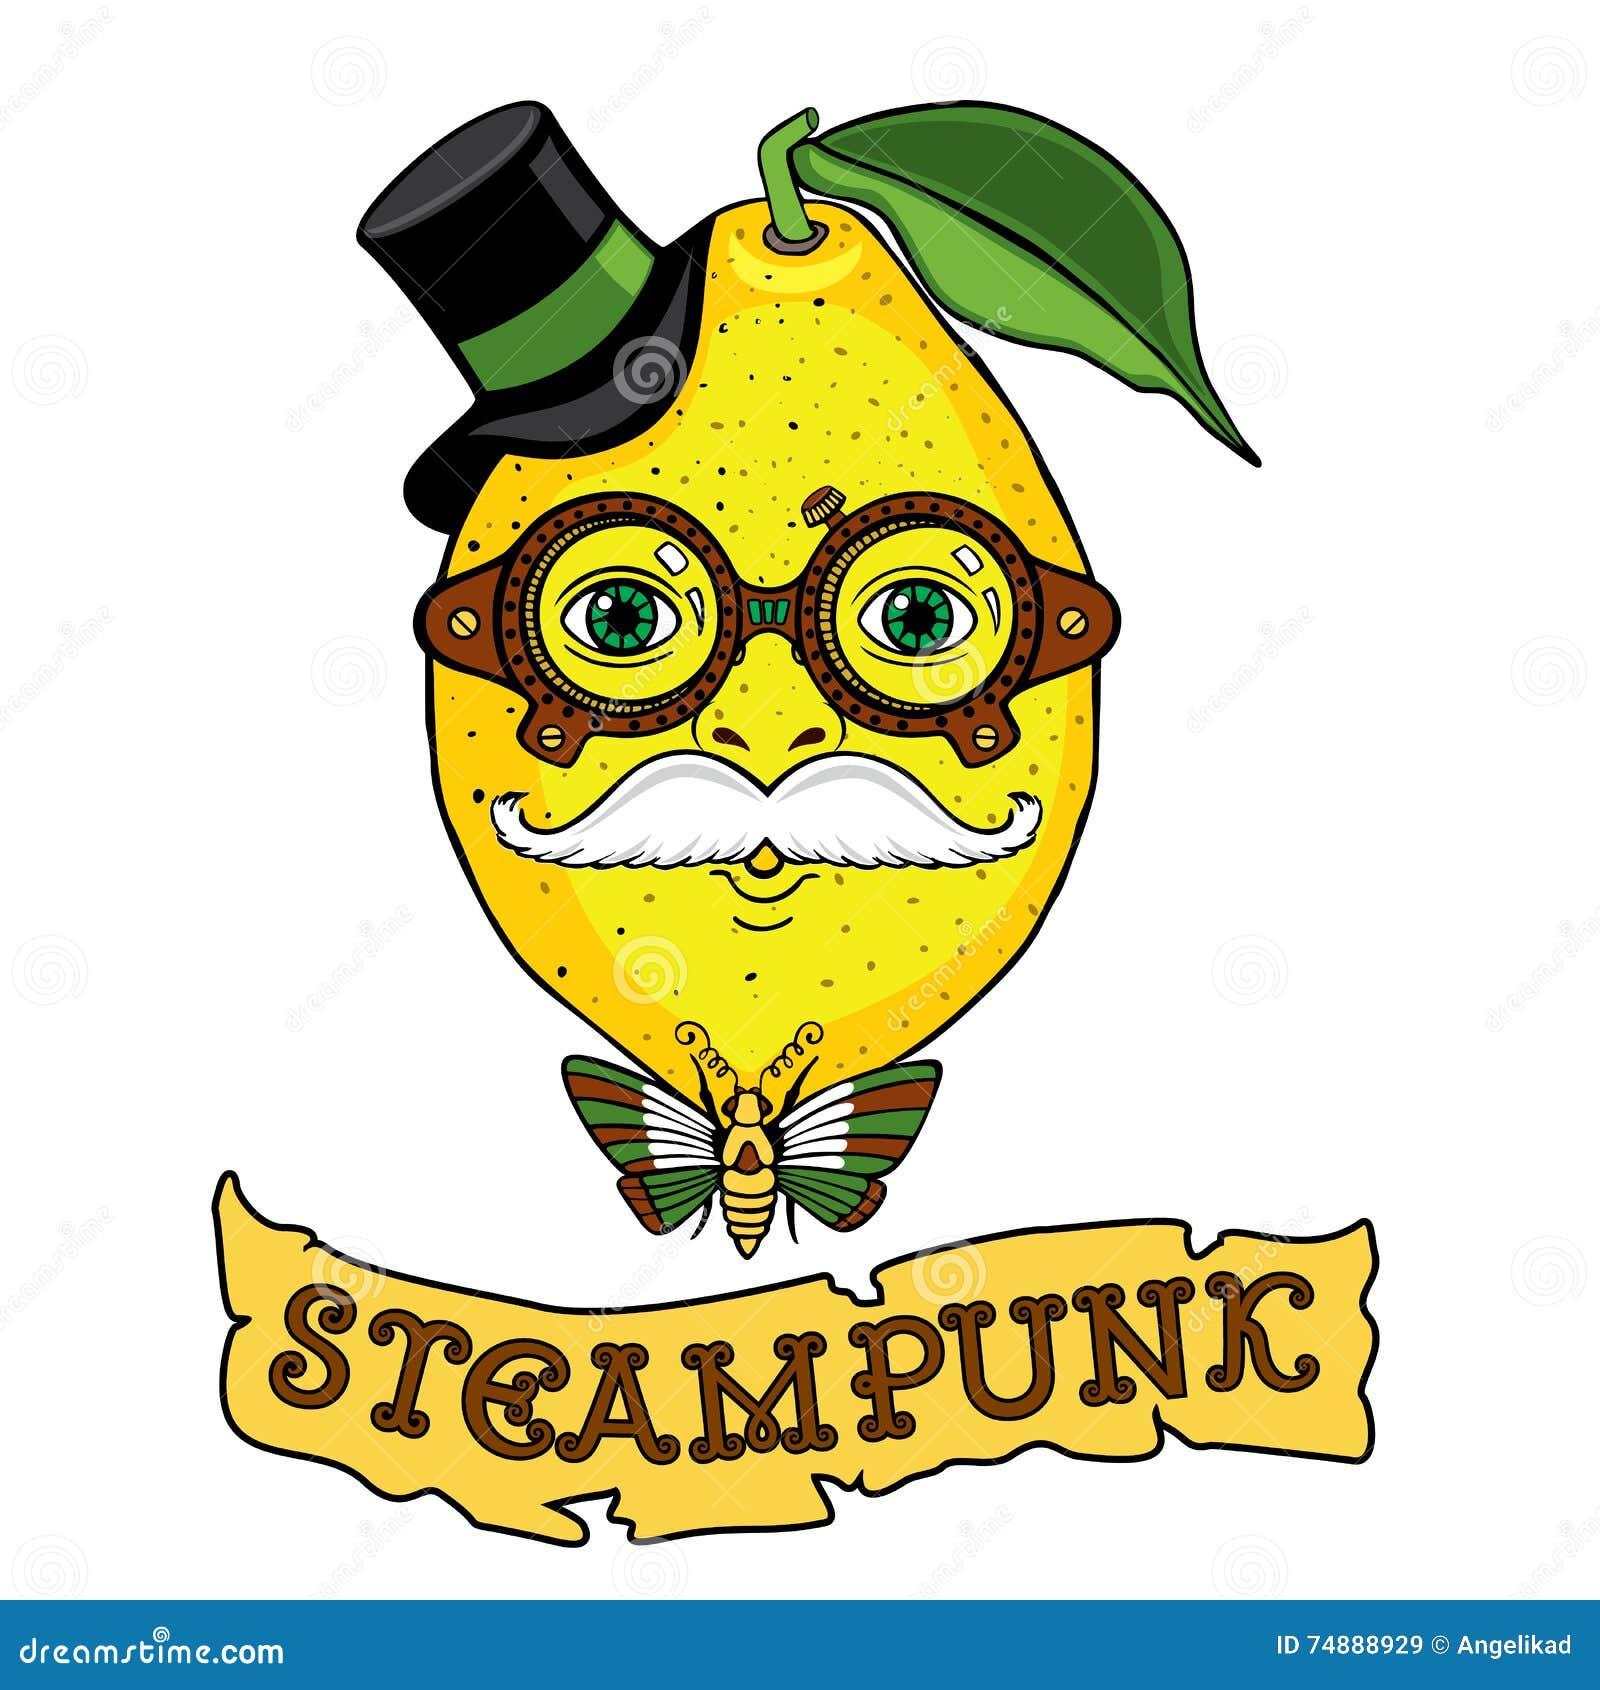 Desenho do Sr. Lemon ao estilo do steampunk